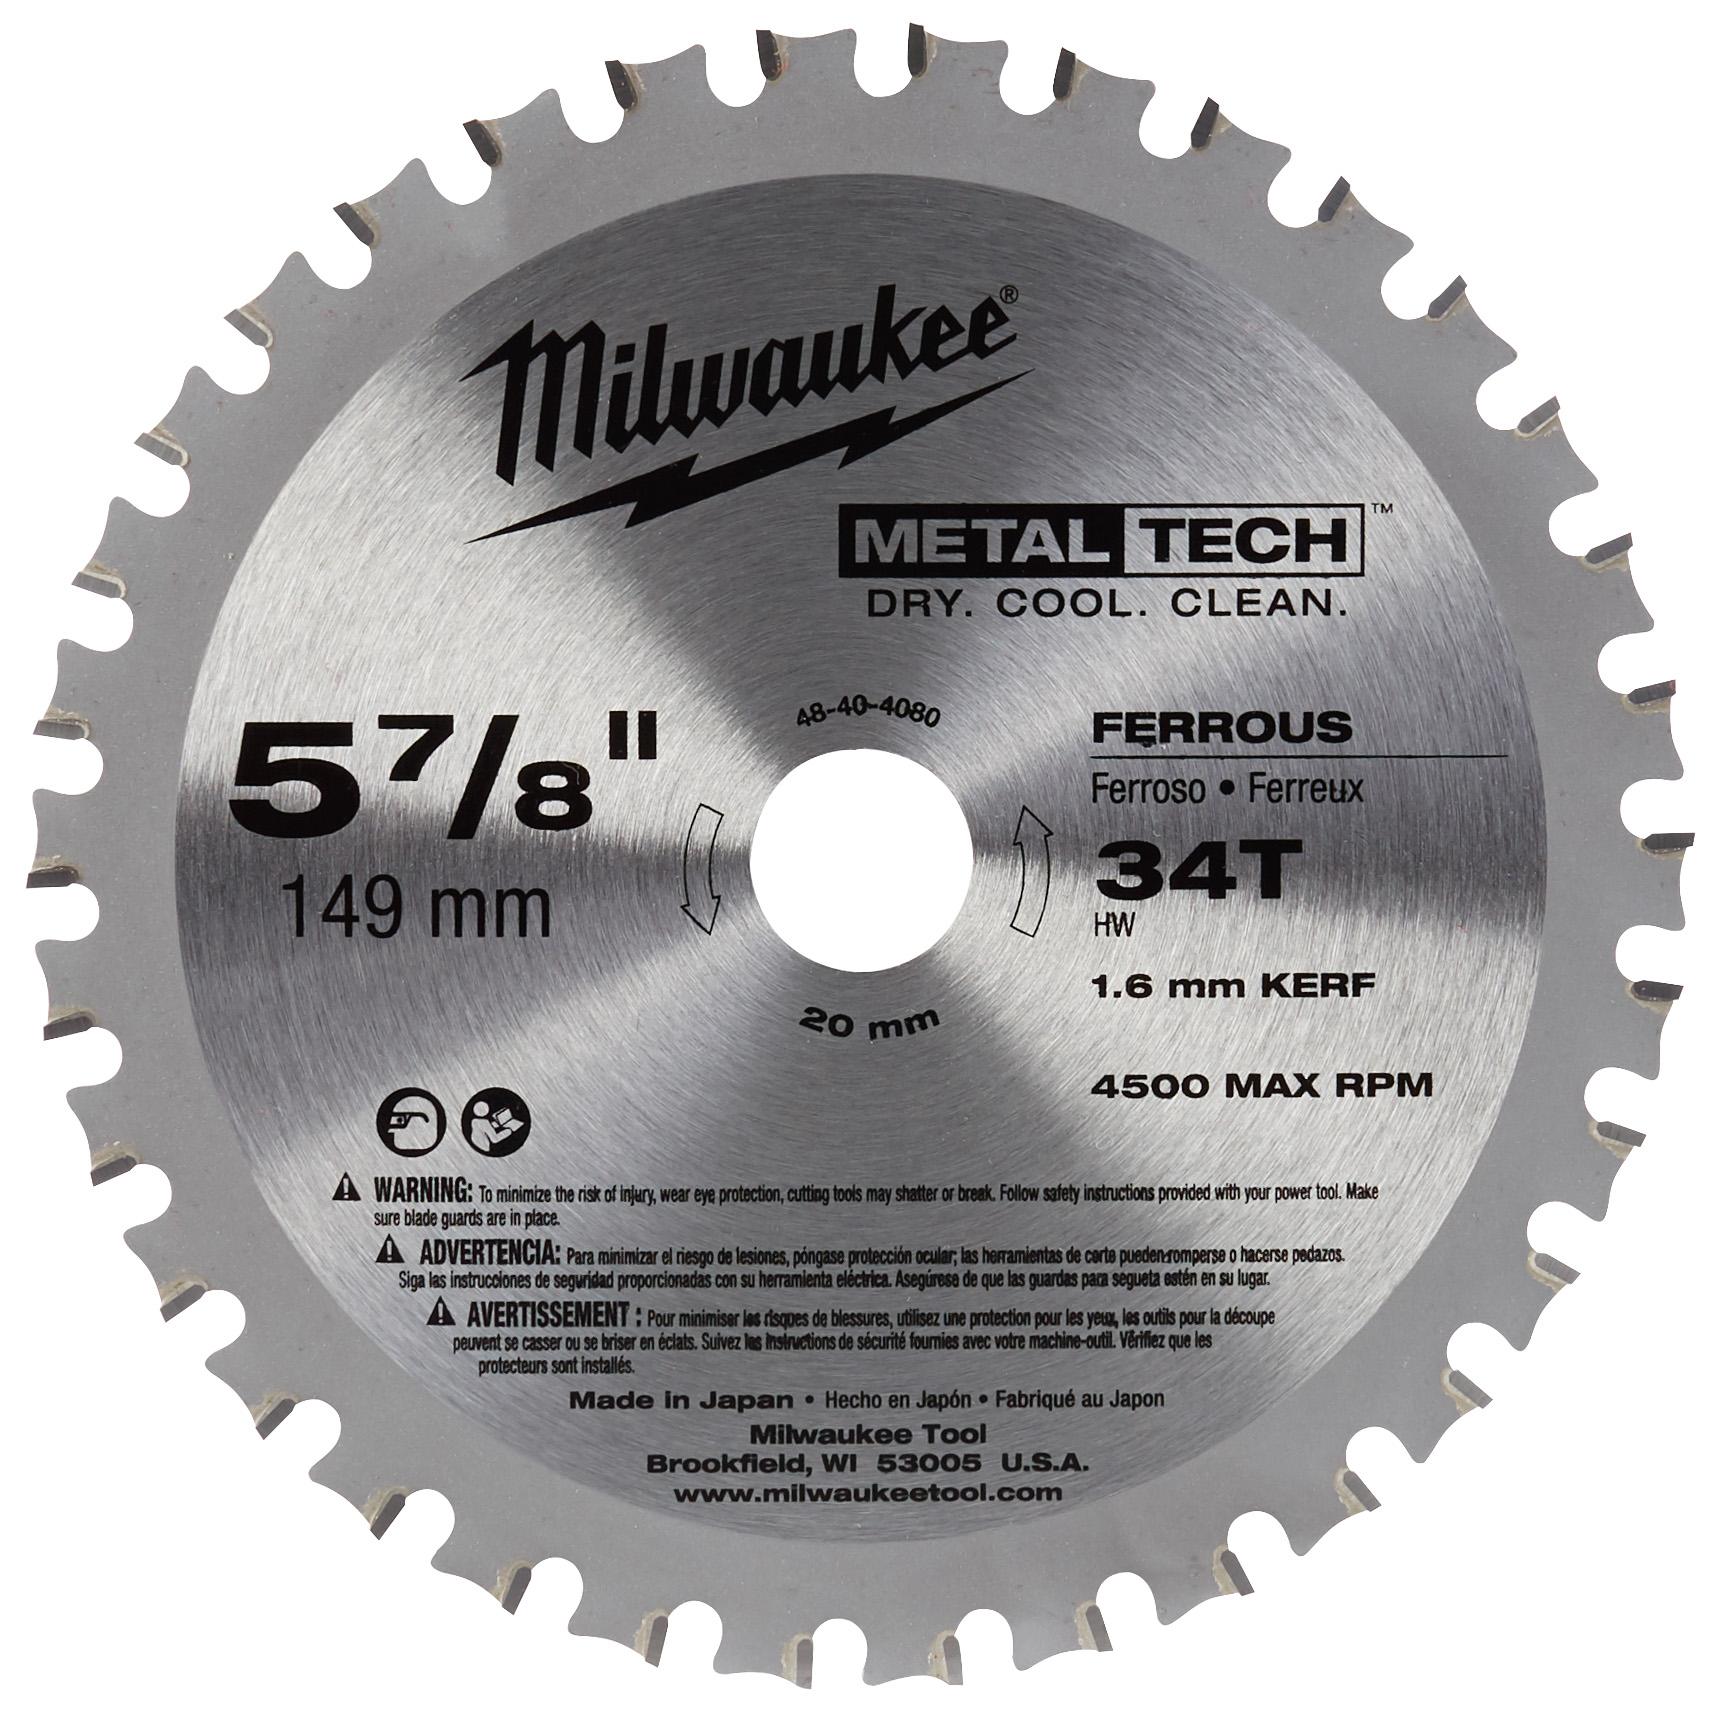 Milwaukee® 48-40-4080 Larger Capacity Circular Saw Blade, 5-7/8 in Dia, 20 mm Arbor, Carbide Blade, 30 Teeth